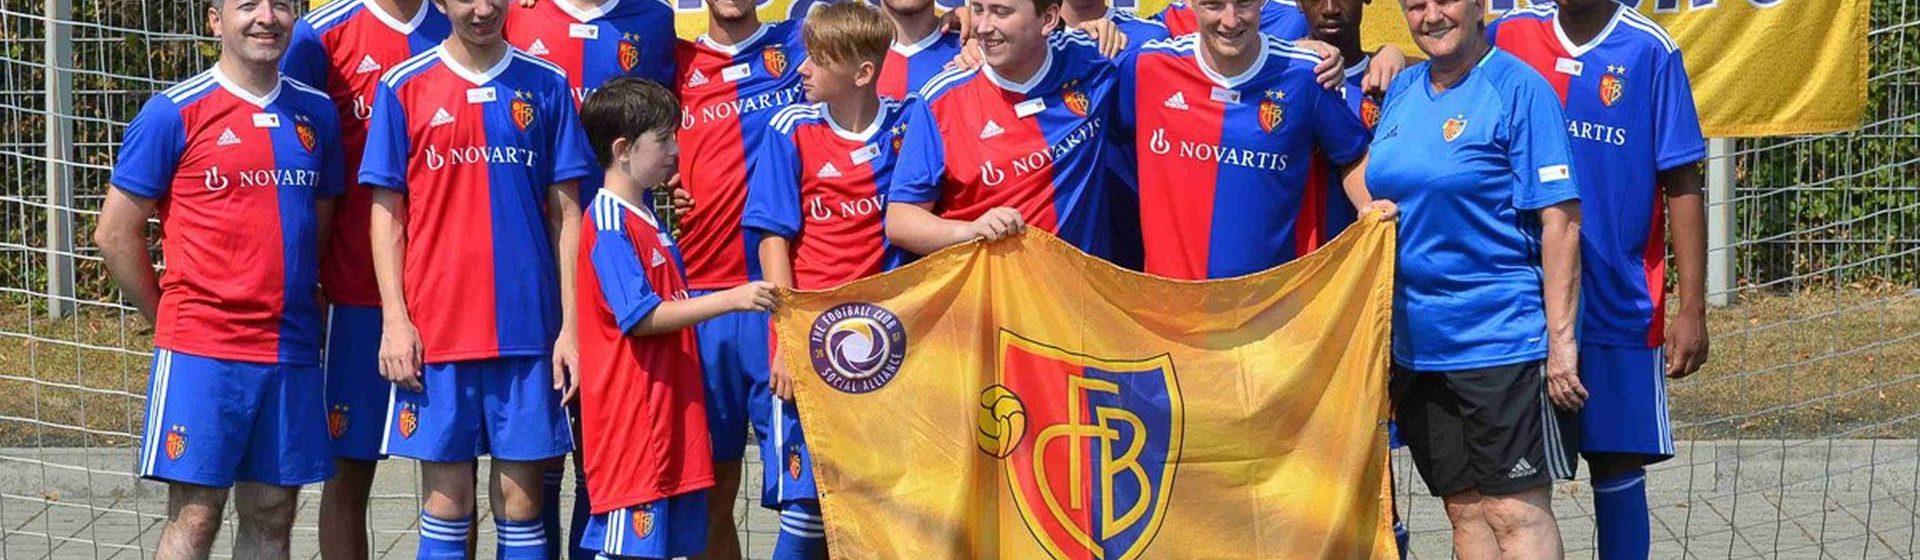 FC Basel 1893 header